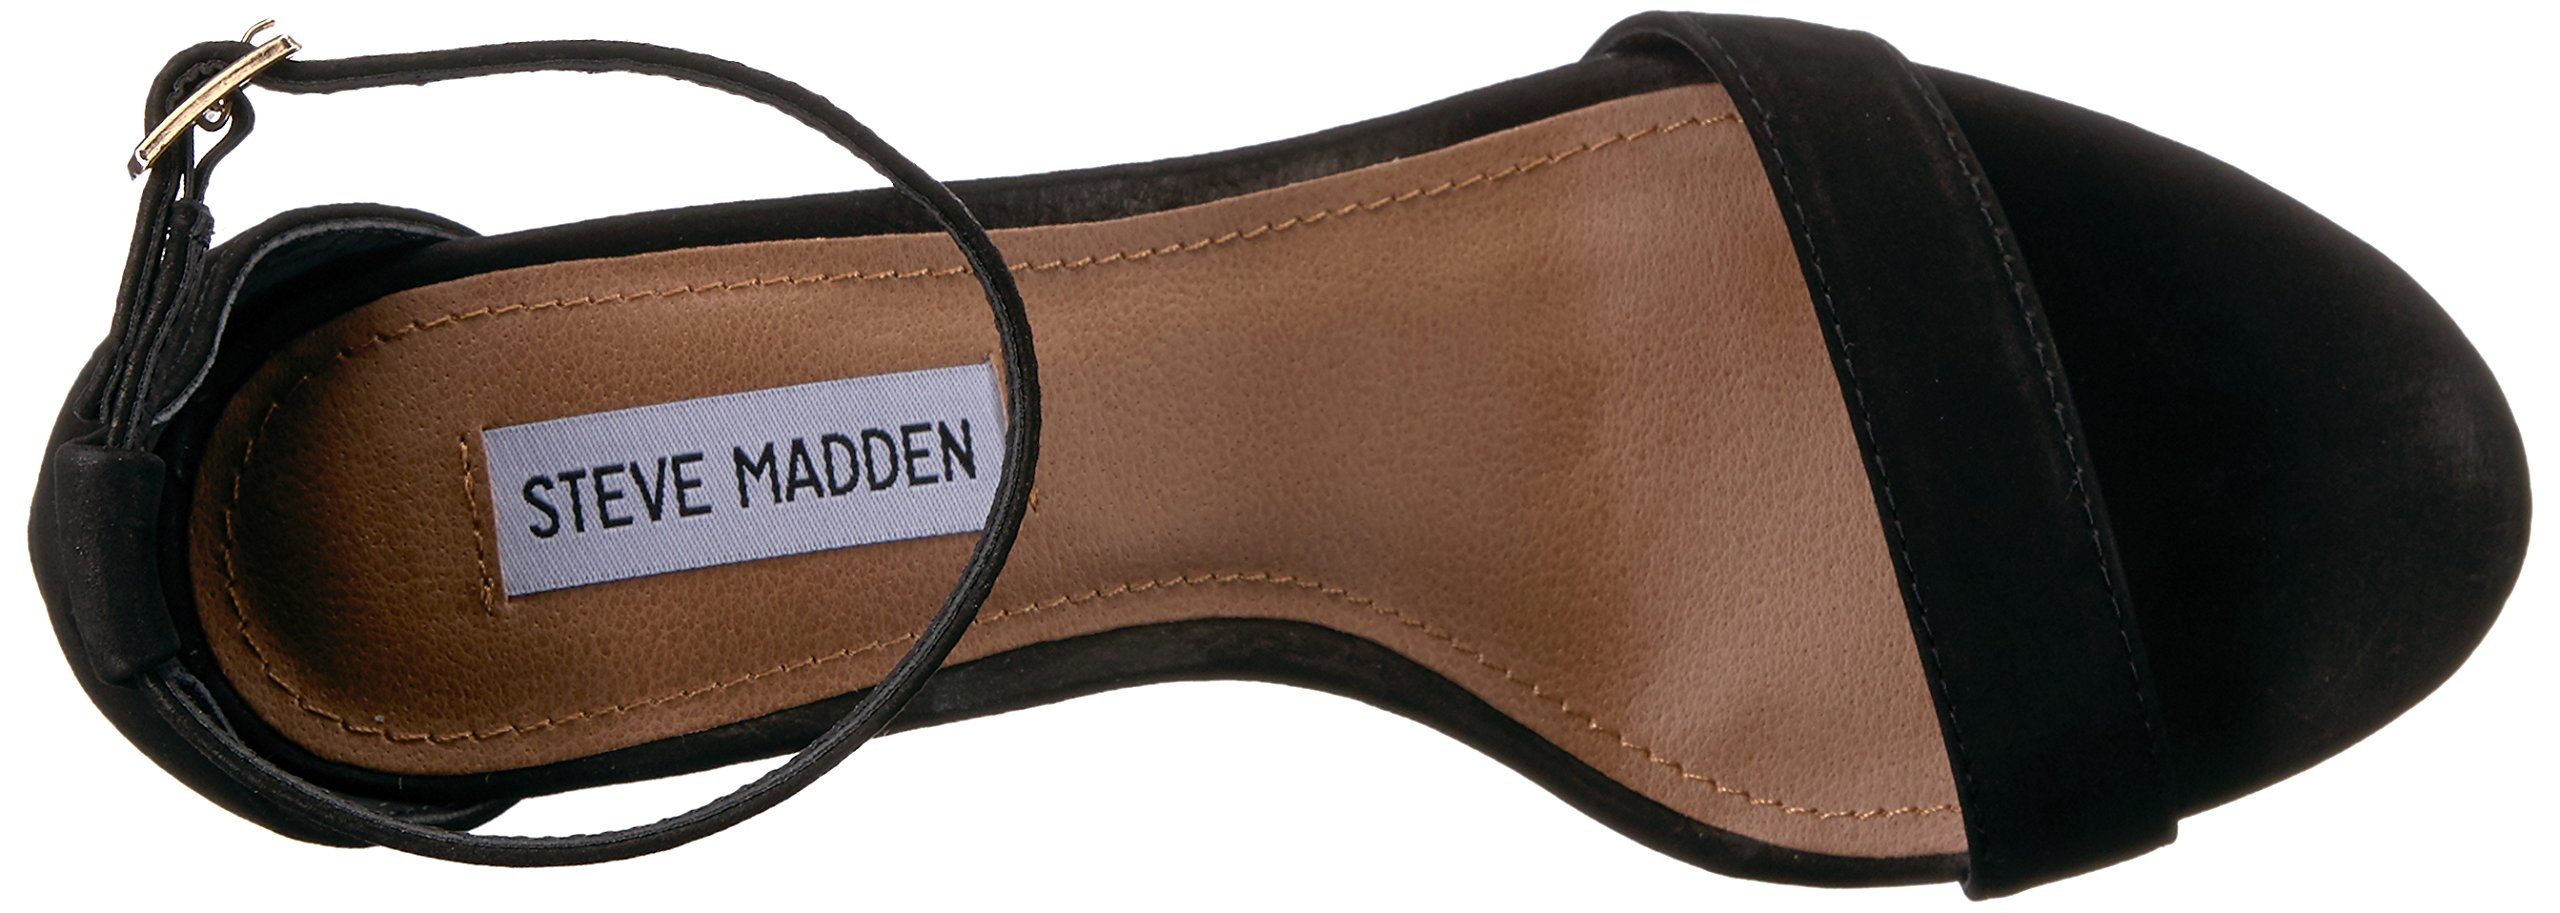 c2be3c1aeaf Steve Madden Women's Declair Dress Sandal < Heeled Sandals ...